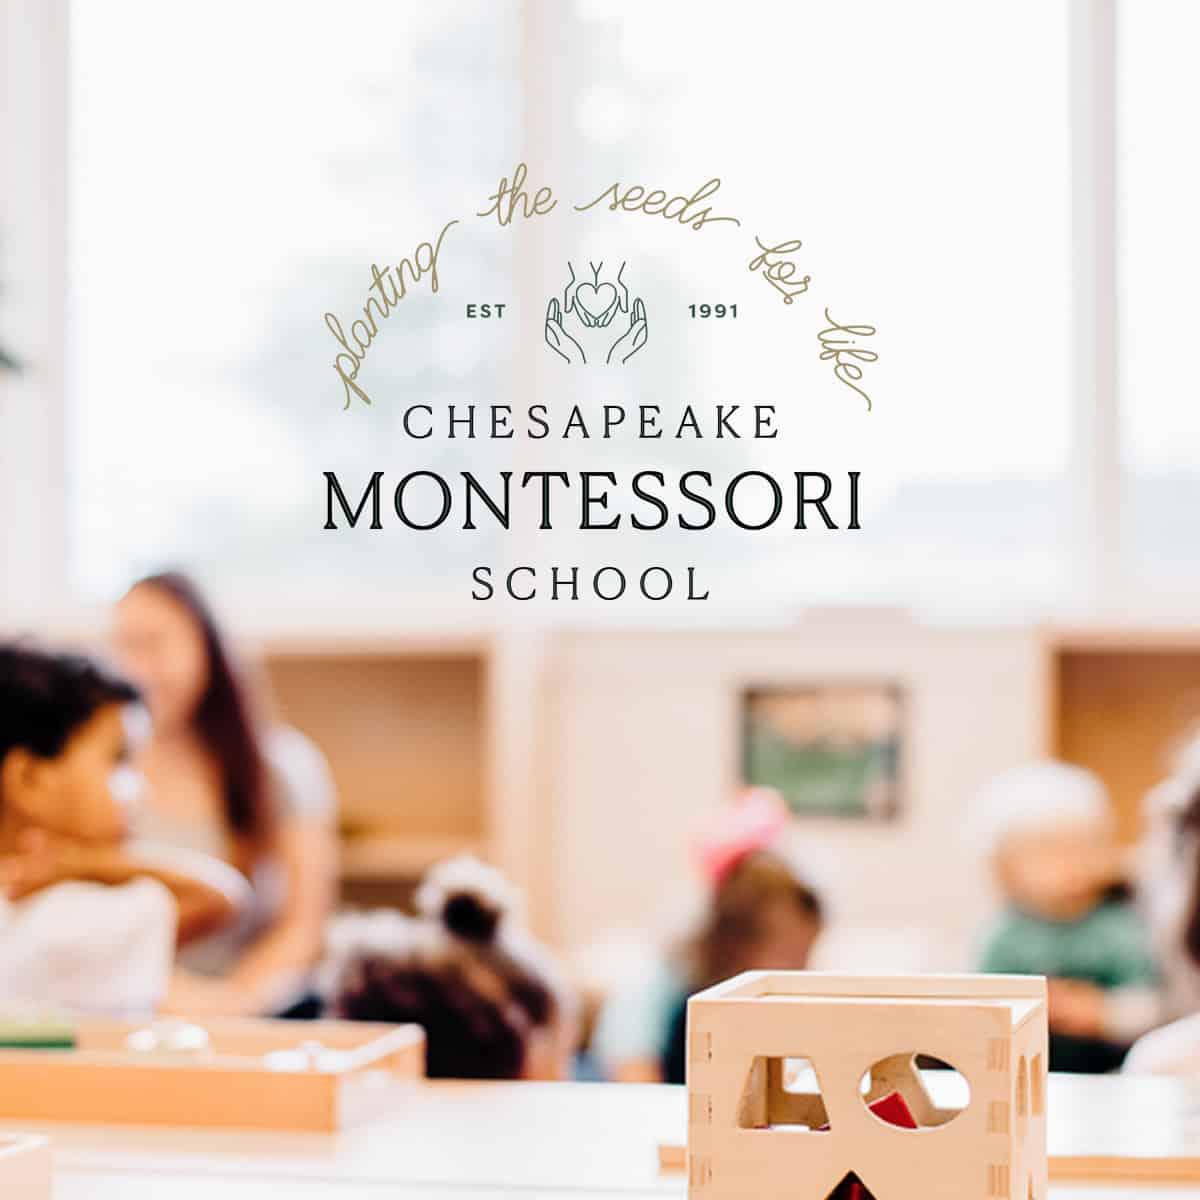 Art Direction for Chesapeake Montessori School